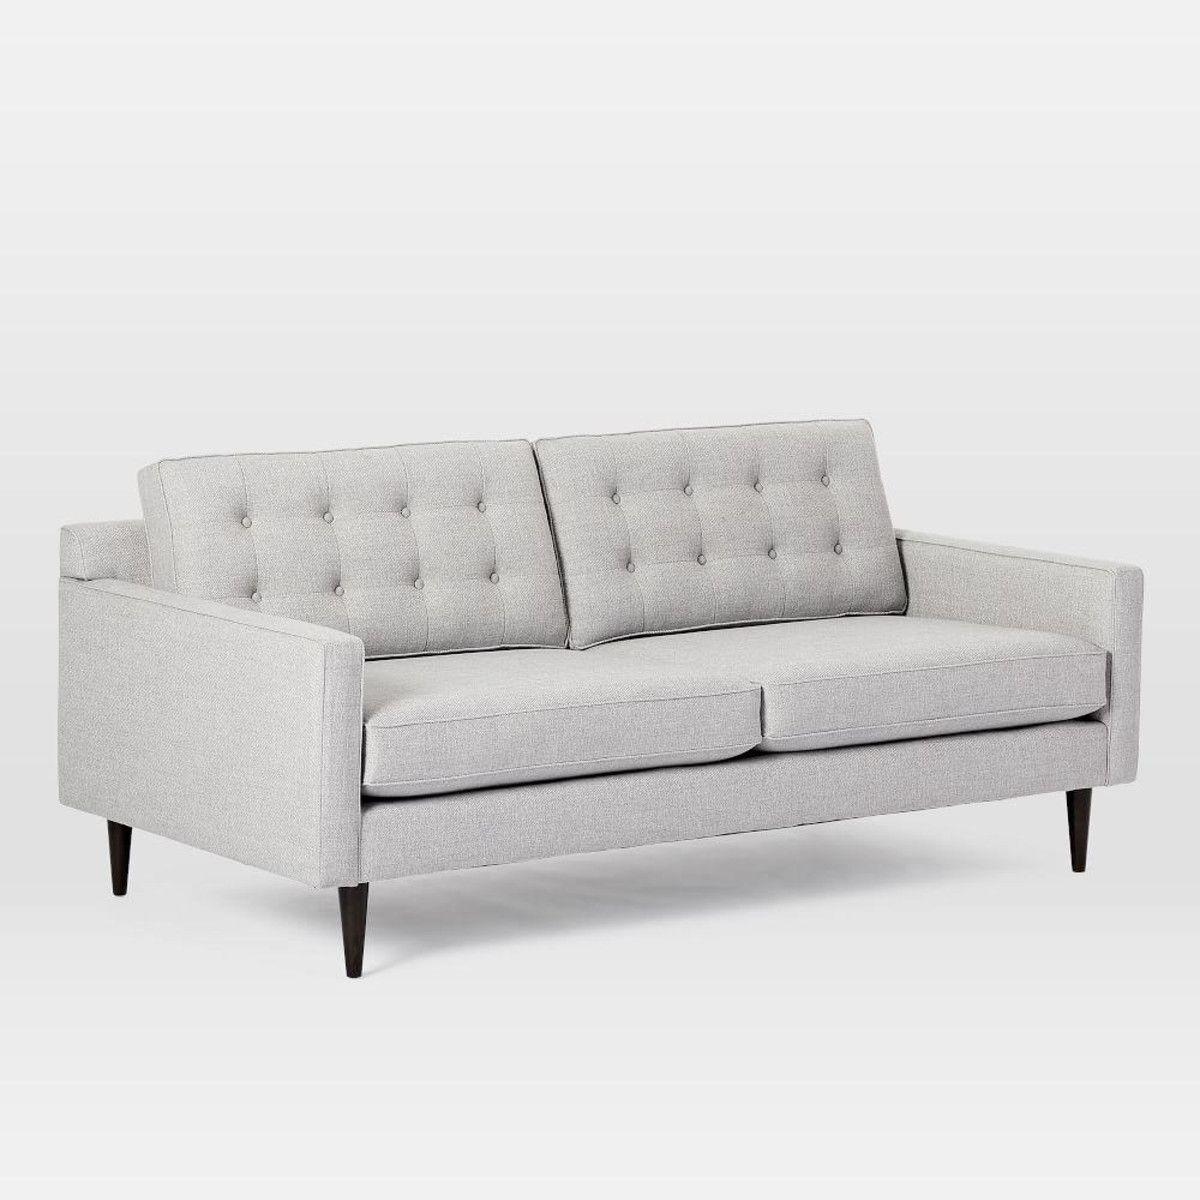 Contemporary Sofas and Loveseats | west elm Canada | Living ...